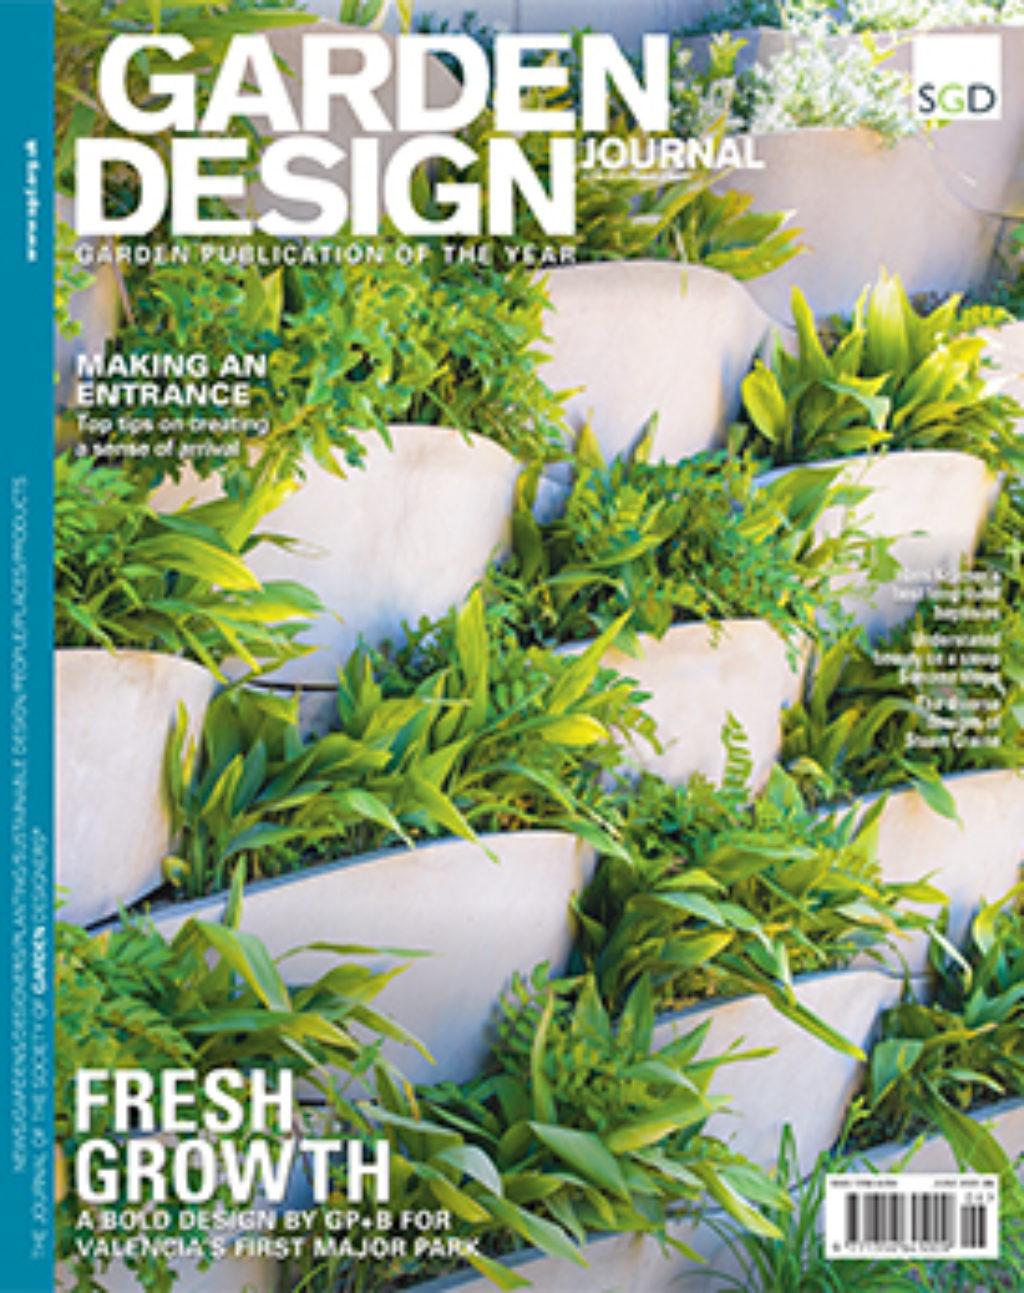 Garden Design Journal June 2020